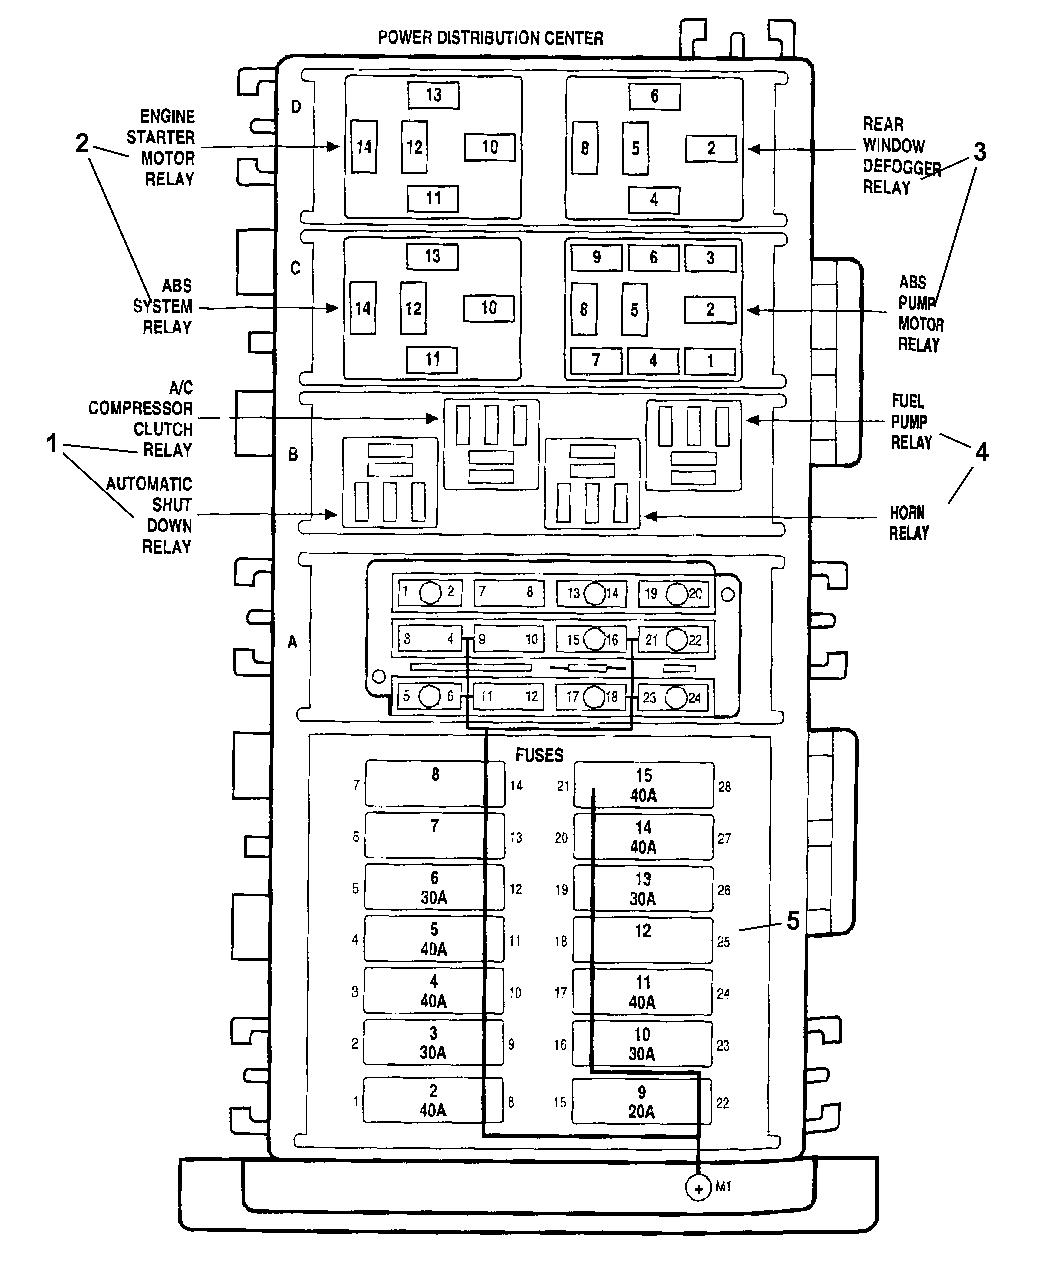 1999 jeep wrangler power distribution center relays \u0026 fuses 1981 Jeep CJ7 Fuse Diagram